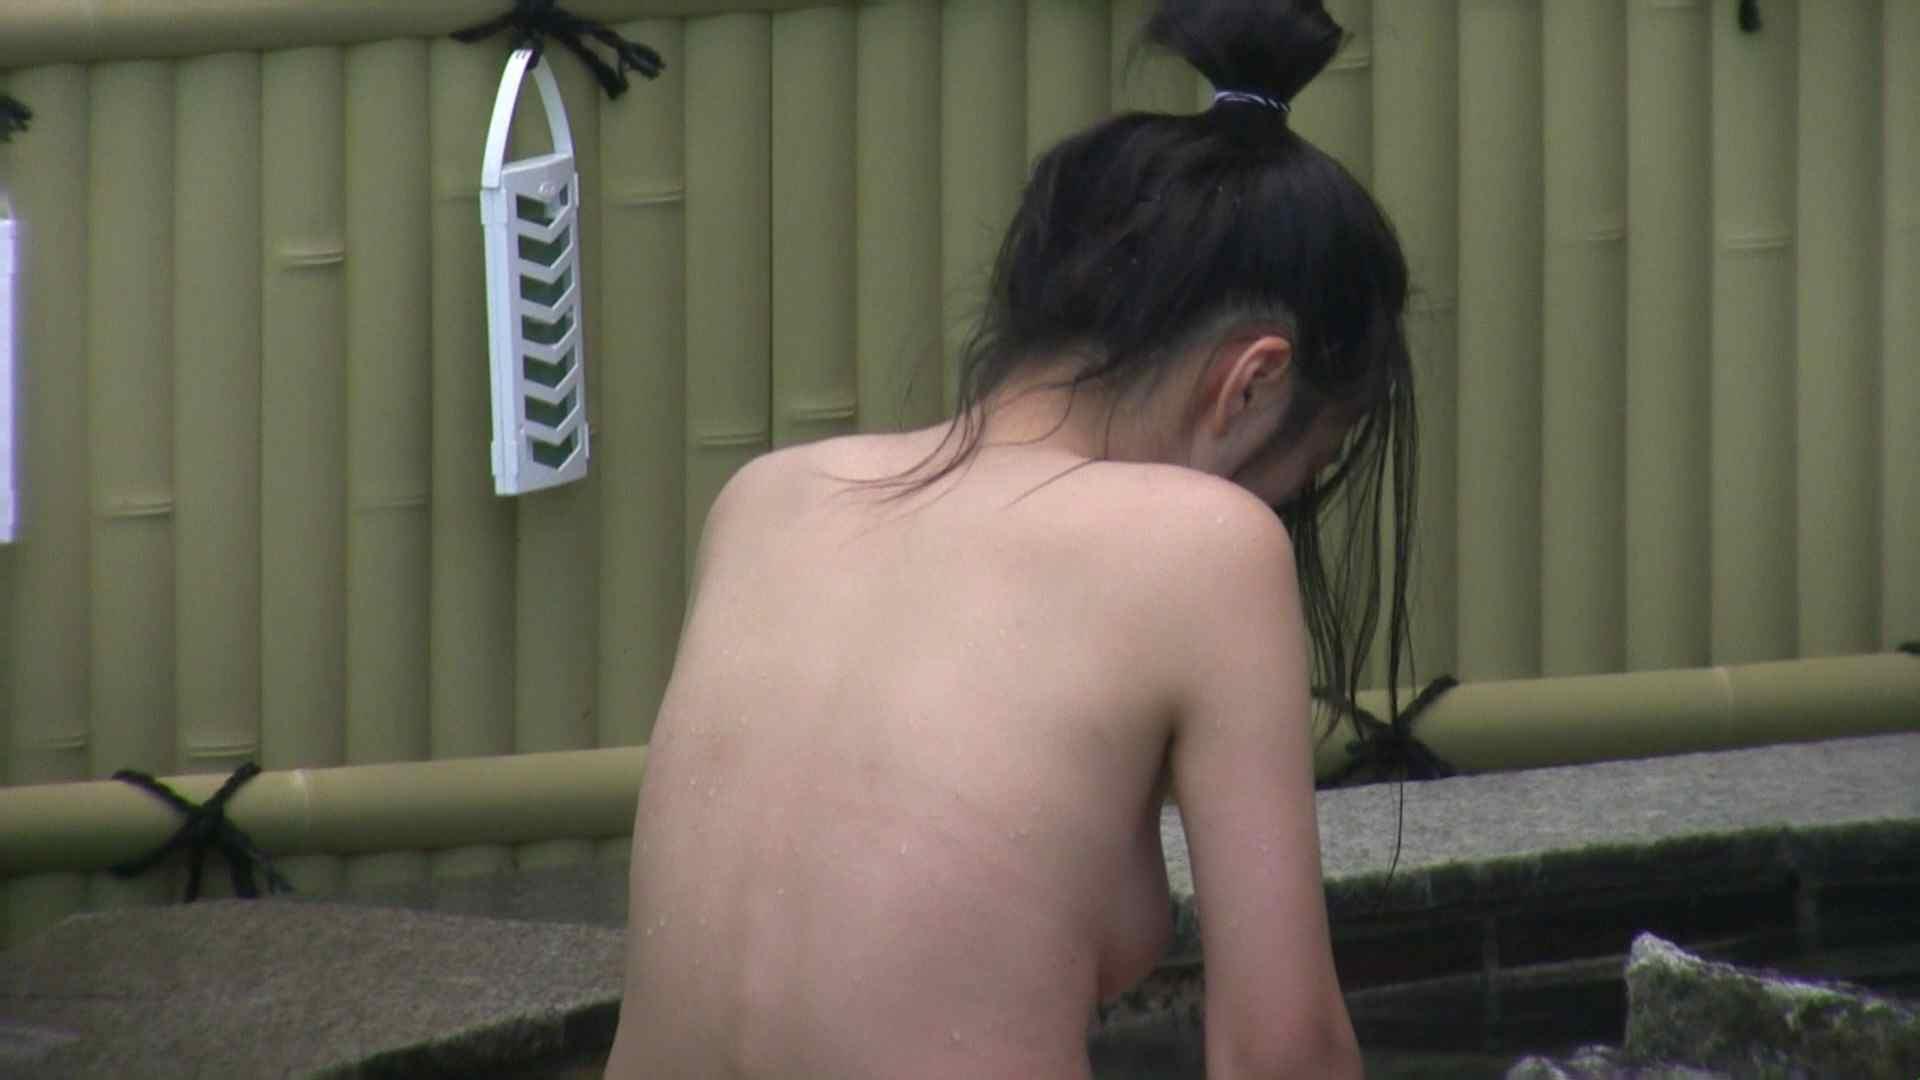 Aquaな露天風呂Vol.87【VIP限定】 盗撮 | HなOL  72pic 61